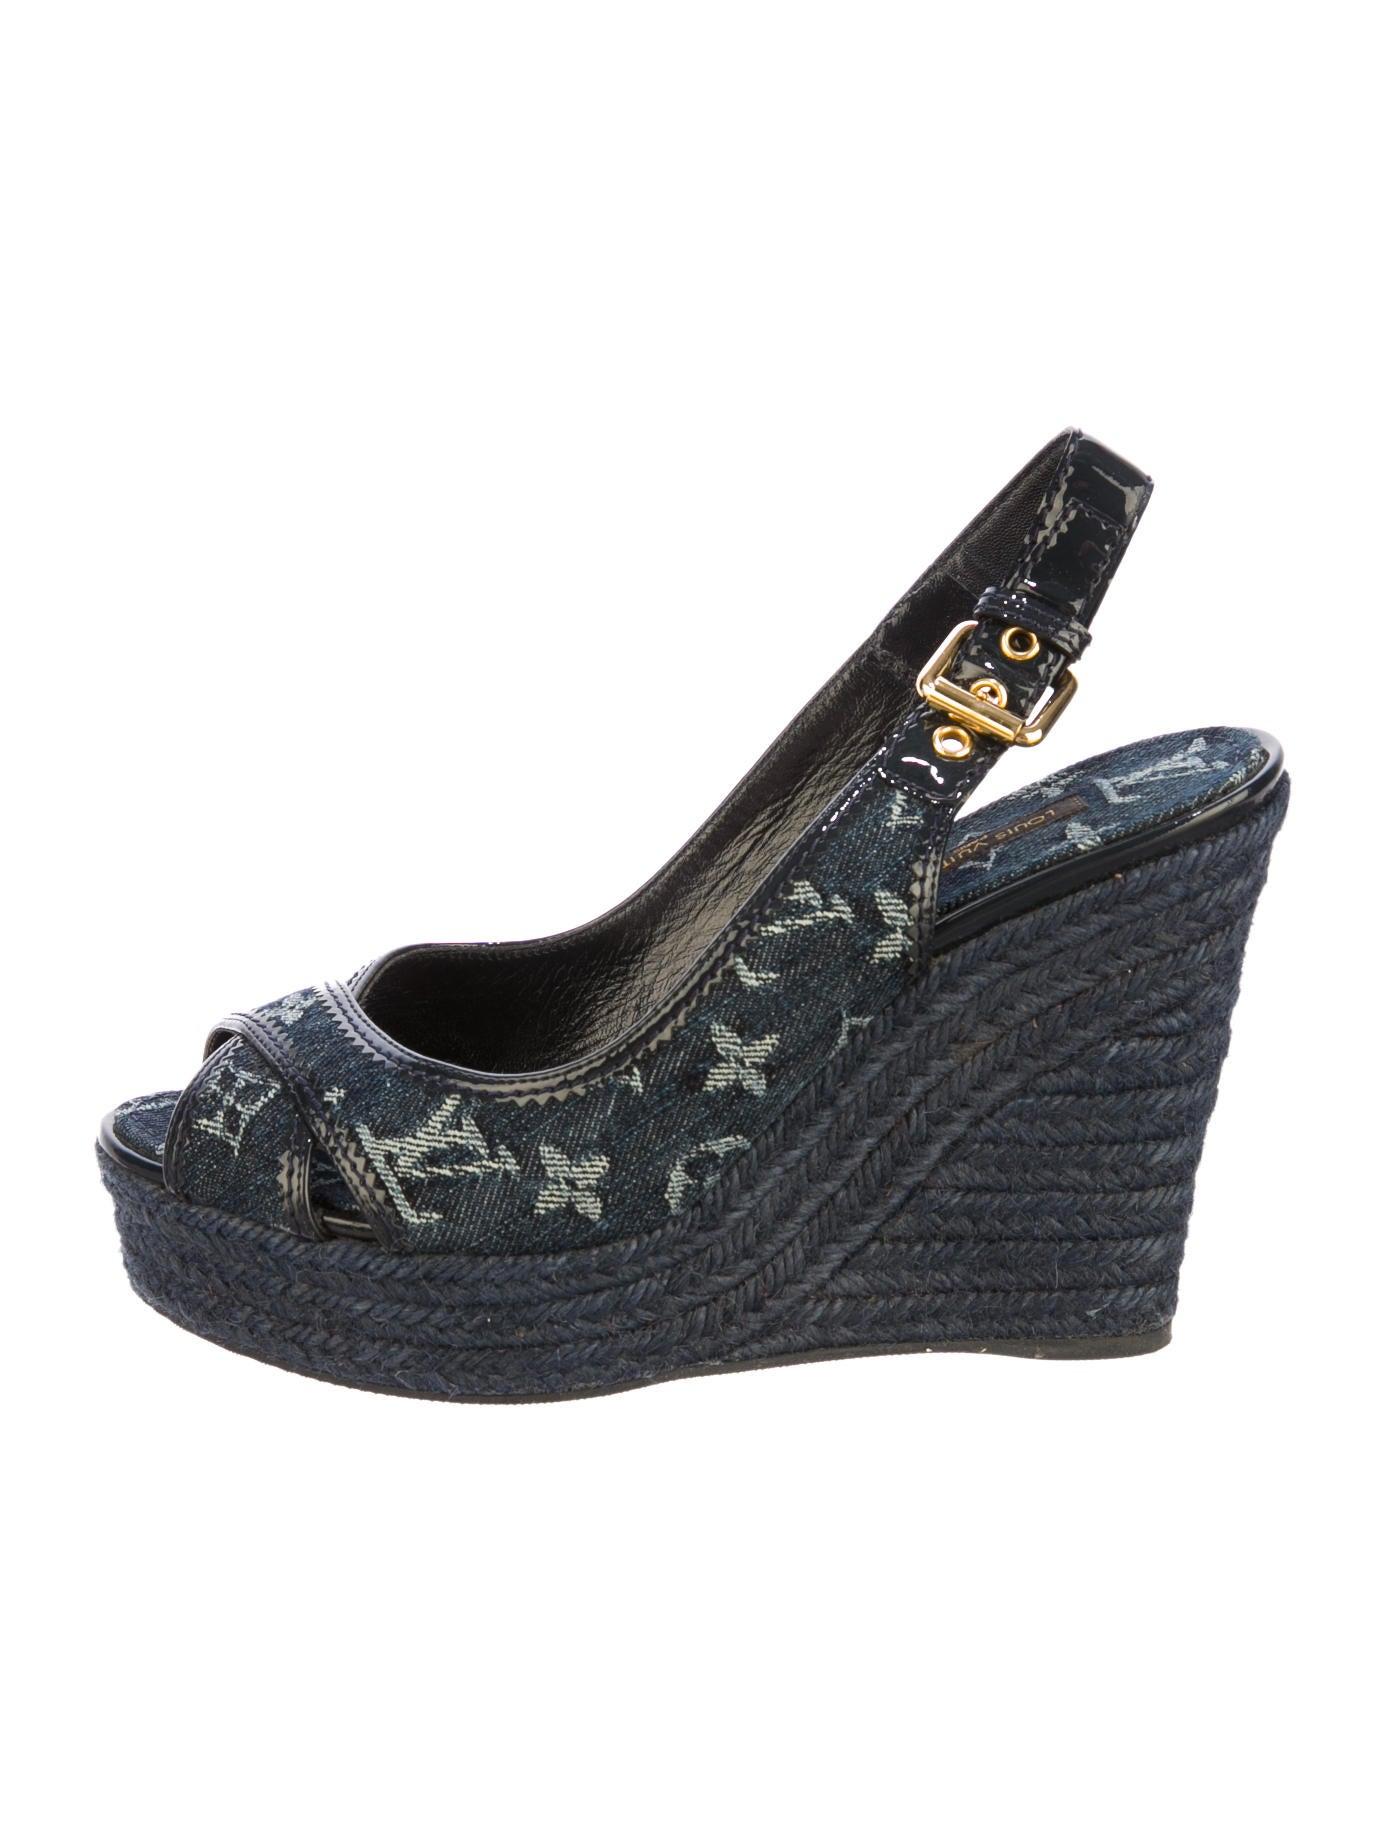 4b3be992ec Louis Vuitton Espadrille Wedges - Shoes - LOU37472 | The RealReal